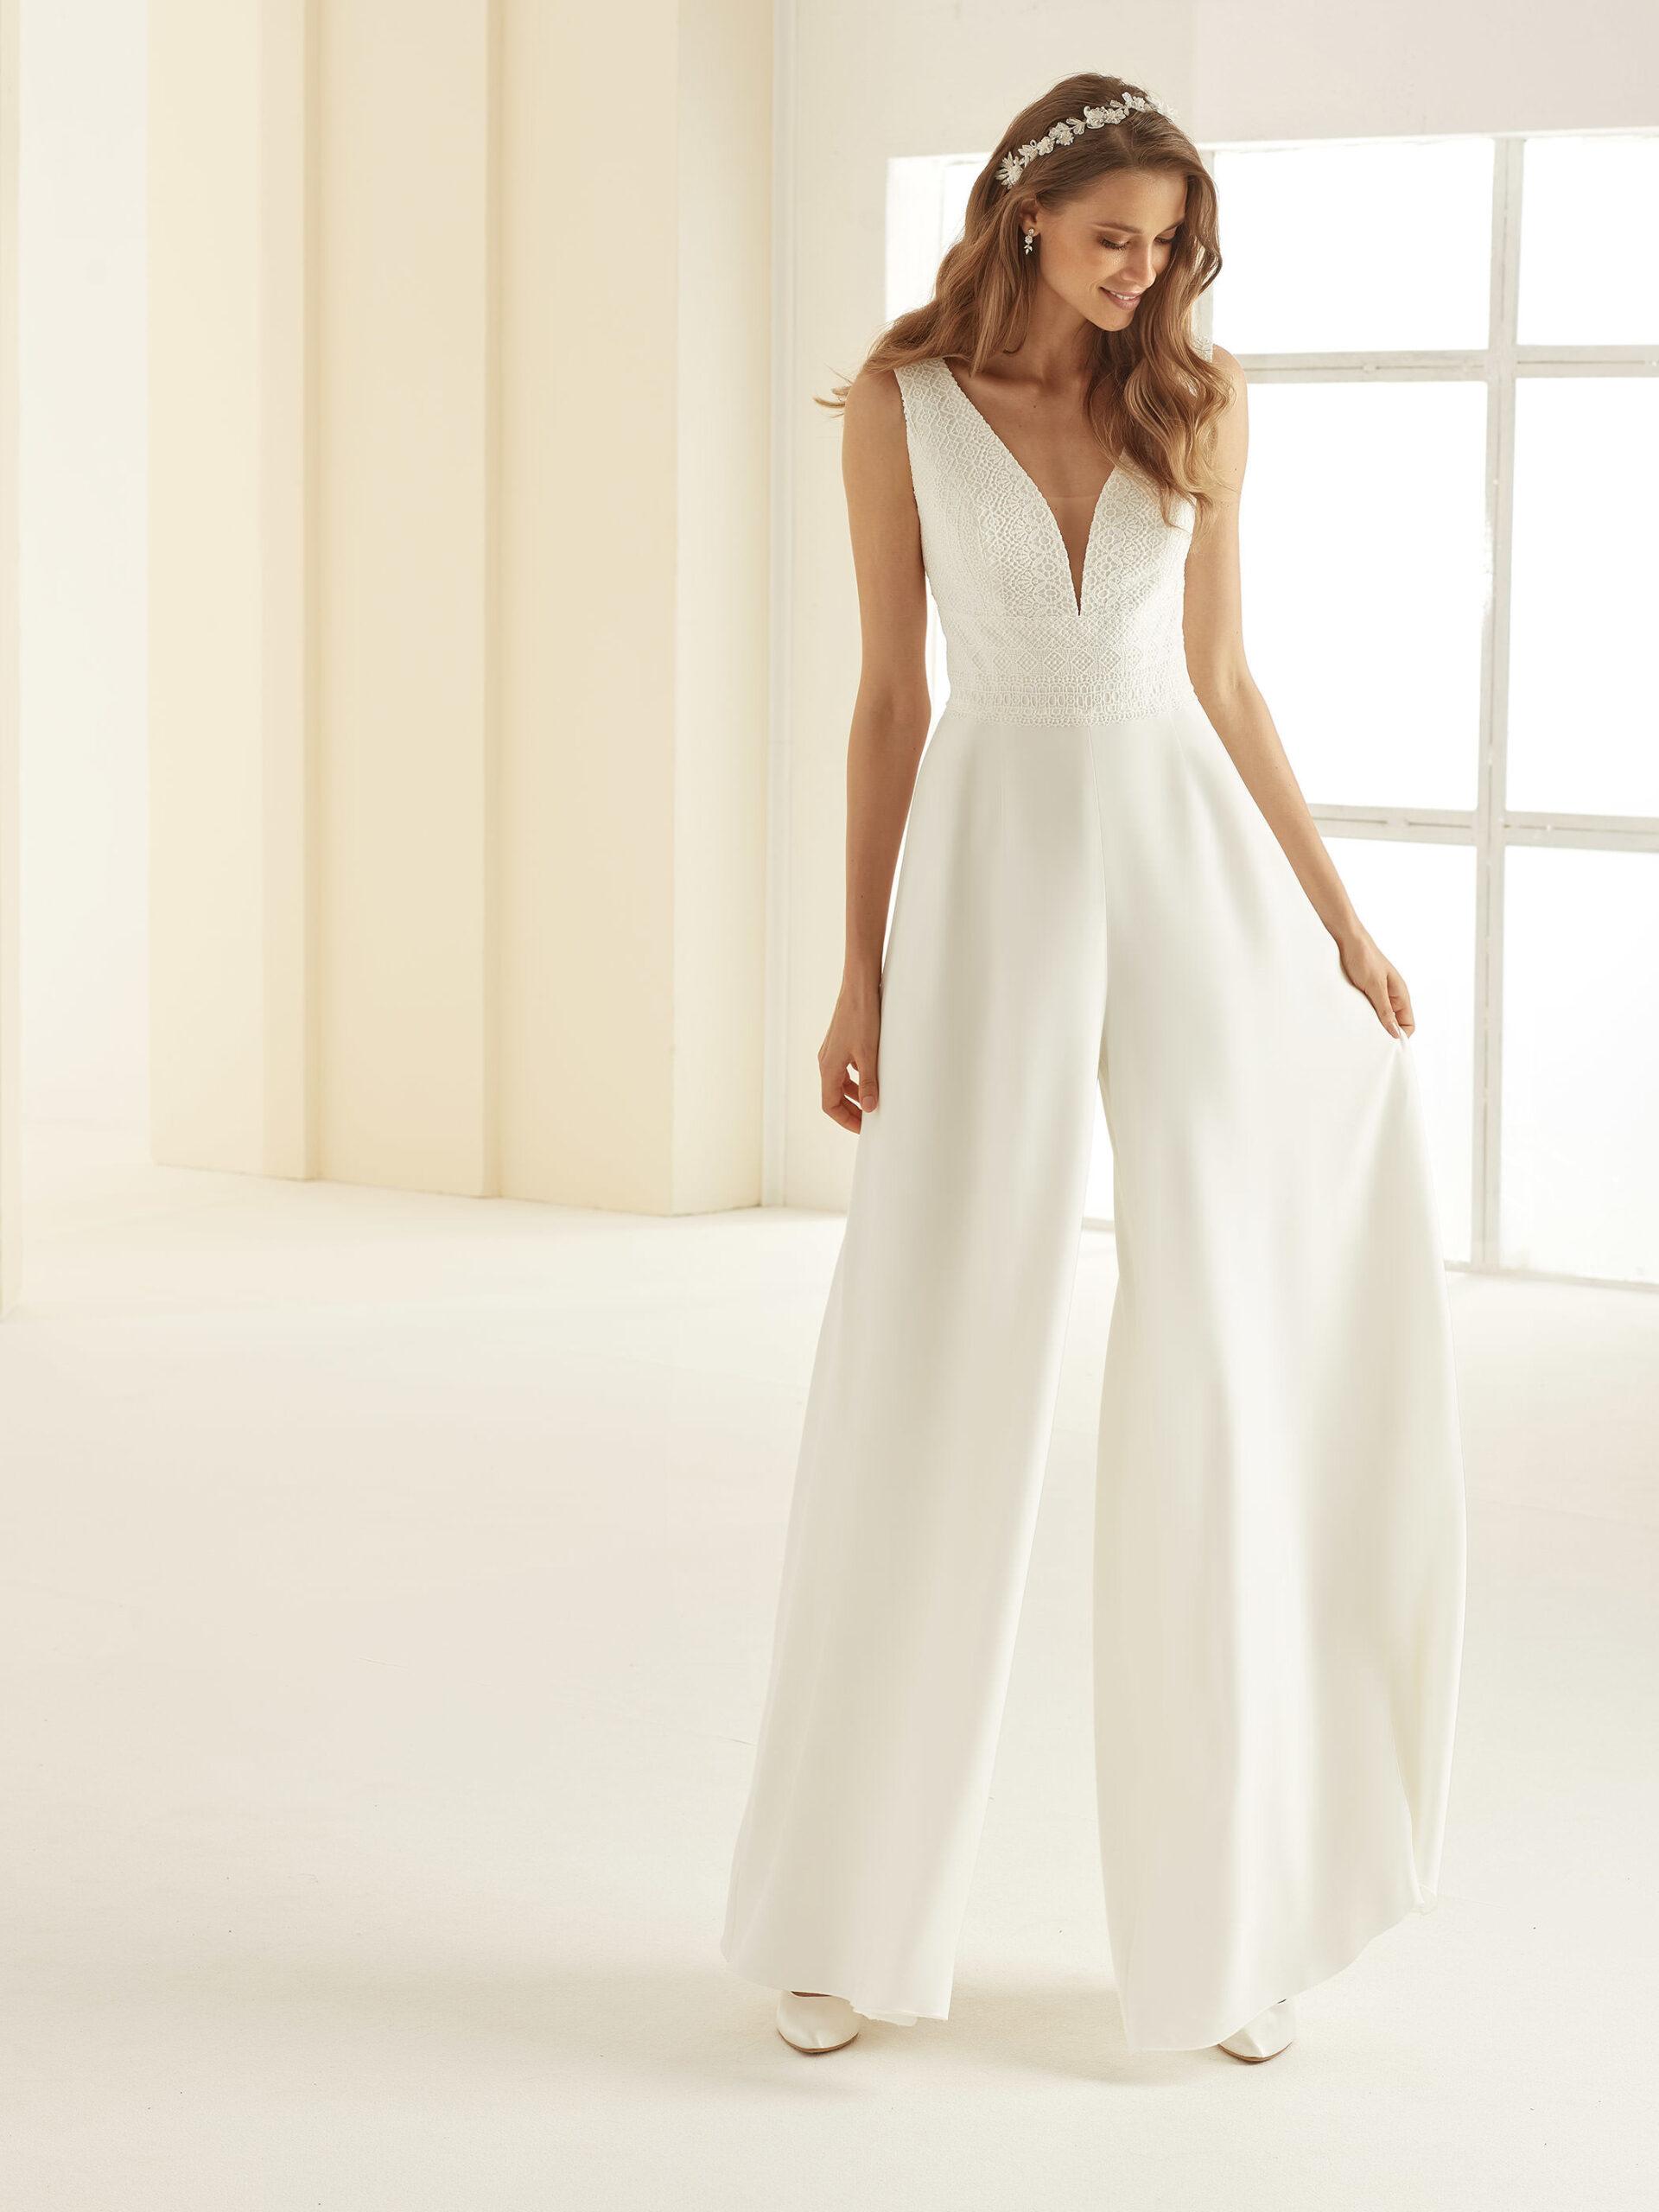 bianco-evento-bridal-jumpsuit-celeste-_1__1